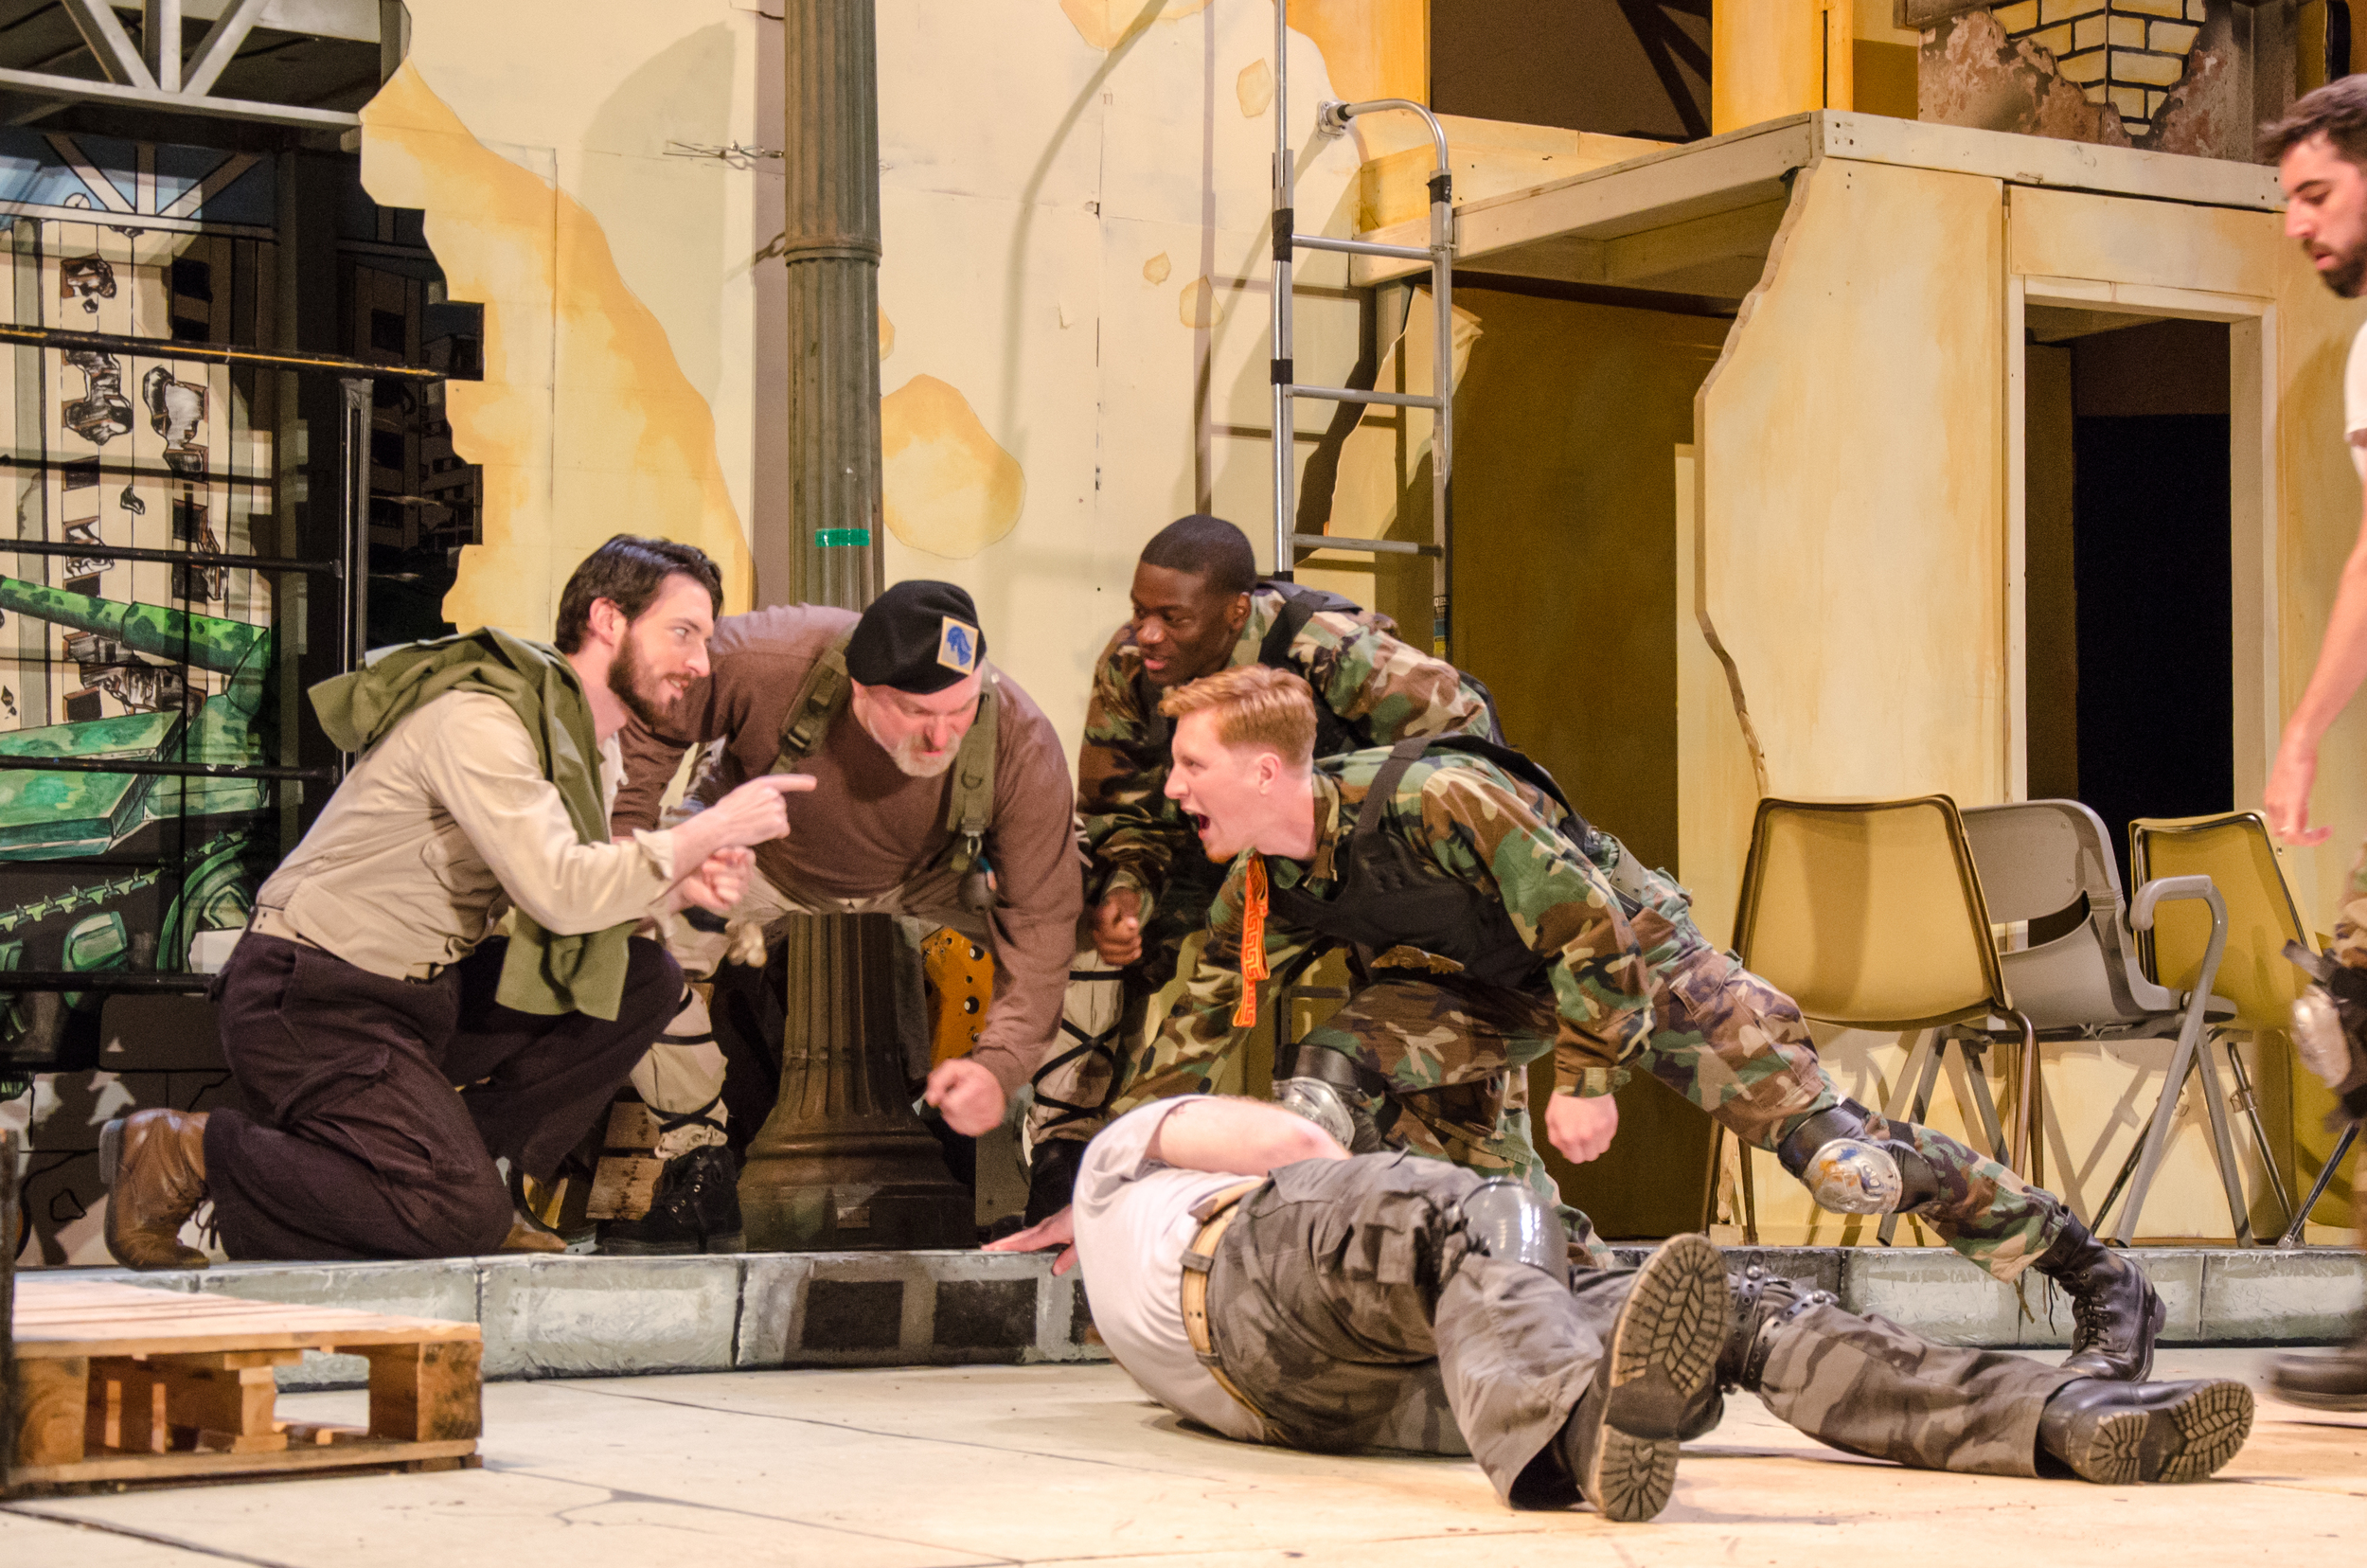 Diomedes (Ross Carmichael), Nestor (Jeff Wasileski), Aeneas (Bernard Joseph), Ajax (Nicholas Wasileski), Troilus (Jared Calhoun)